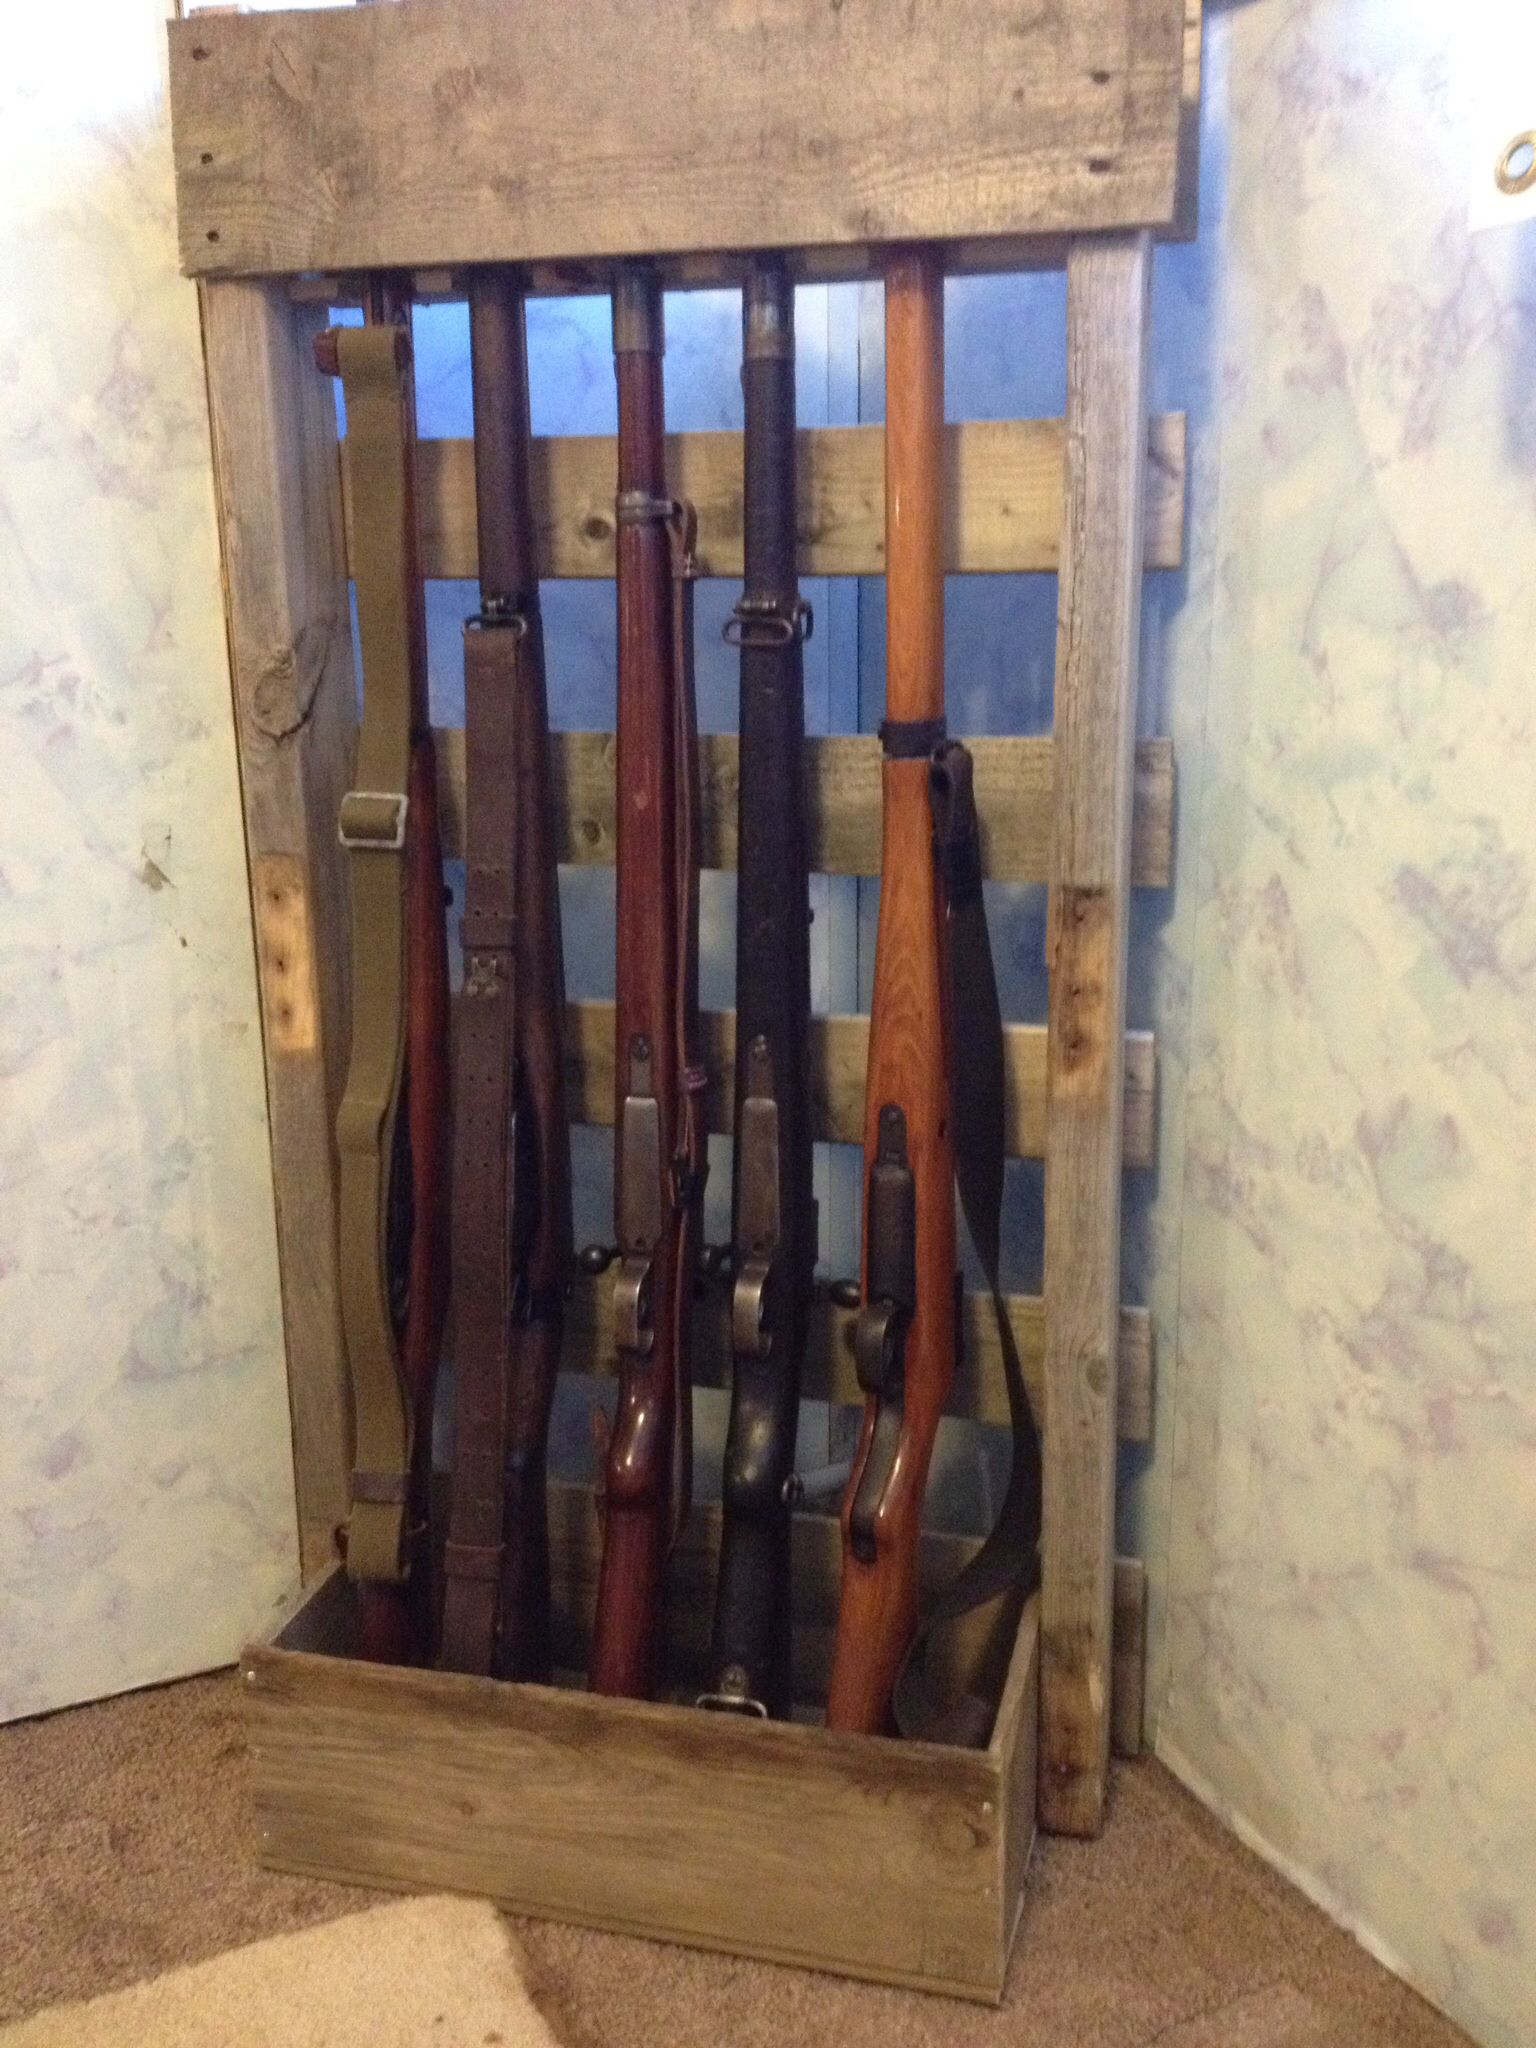 Double pistol handgun revolver gun display case cabinet rack shadowbox - Took An Old Pallet And Made A Vertical Gun Rack For My Wwii Firearms